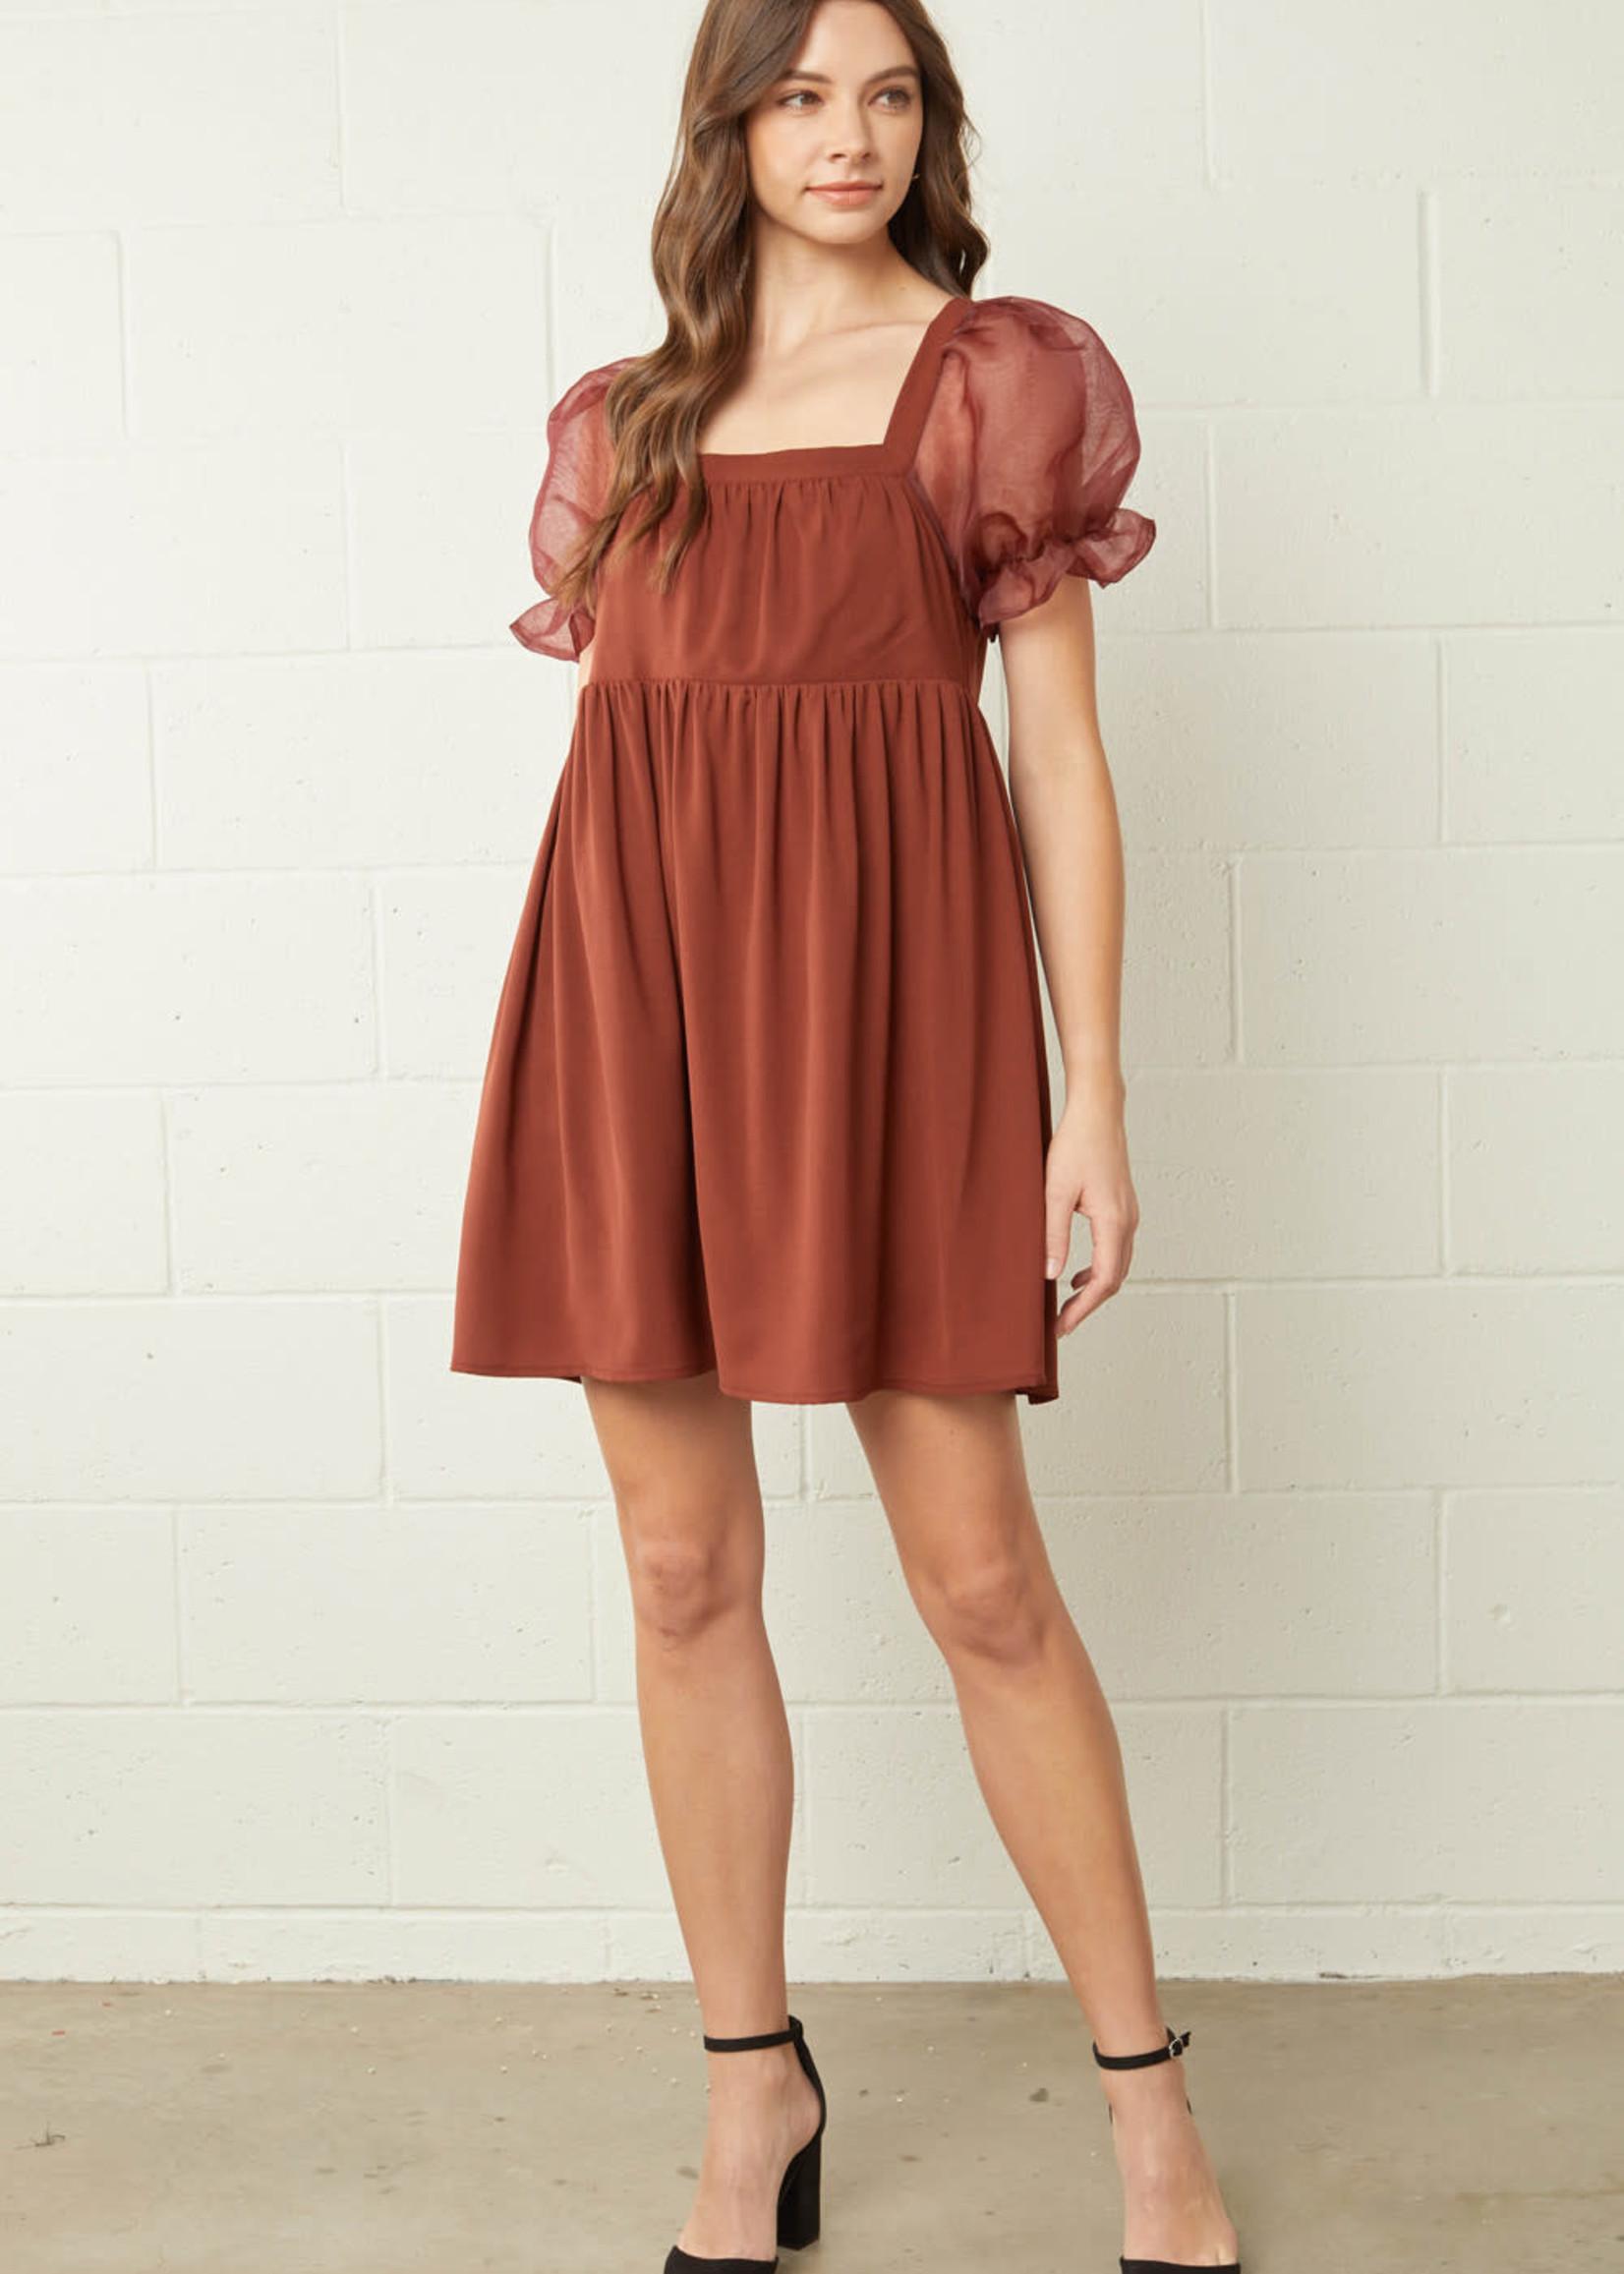 Sheer Delight Rust Dress